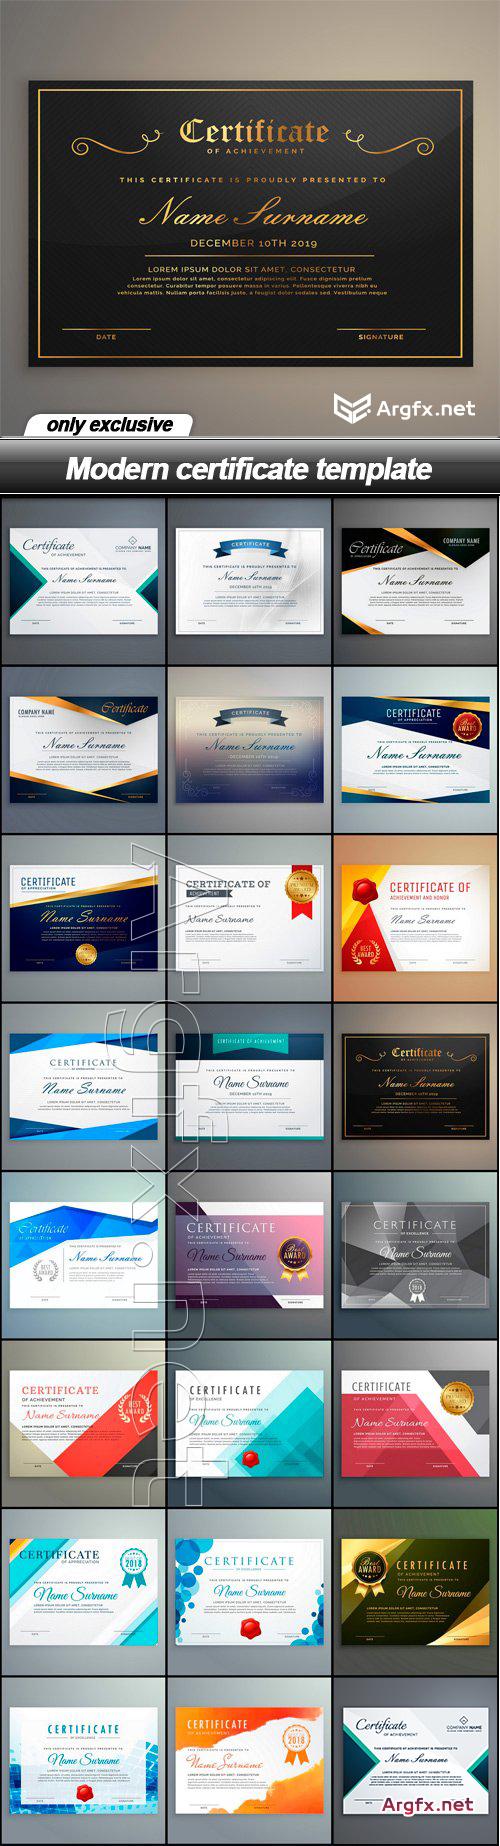 Modern certificate template - 57 EPS